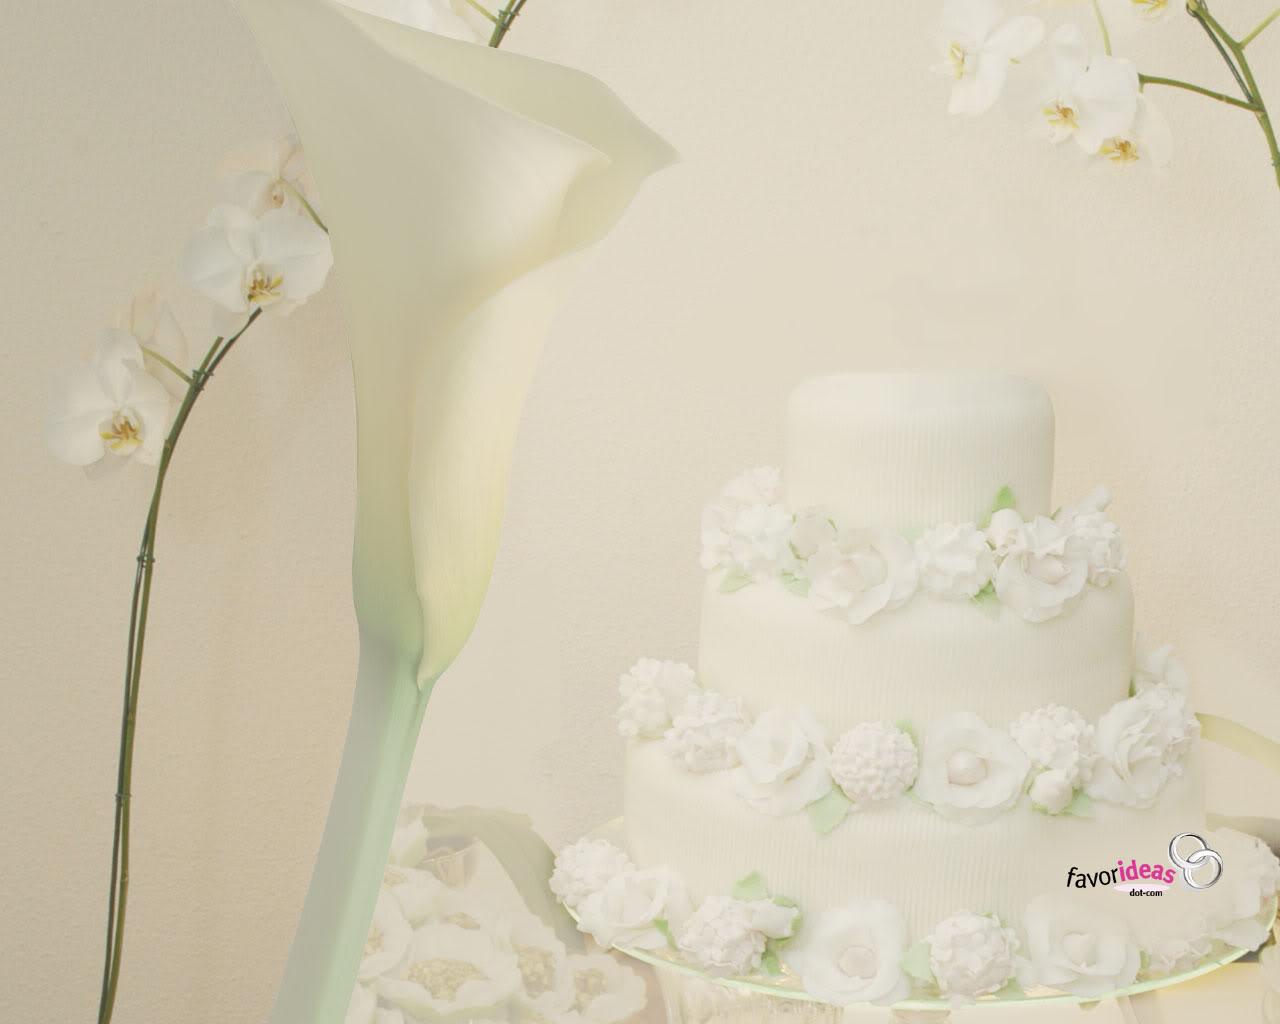 Wedding Wallpapers For Desktop Backgrounds HD Wallpapers 1280x1024